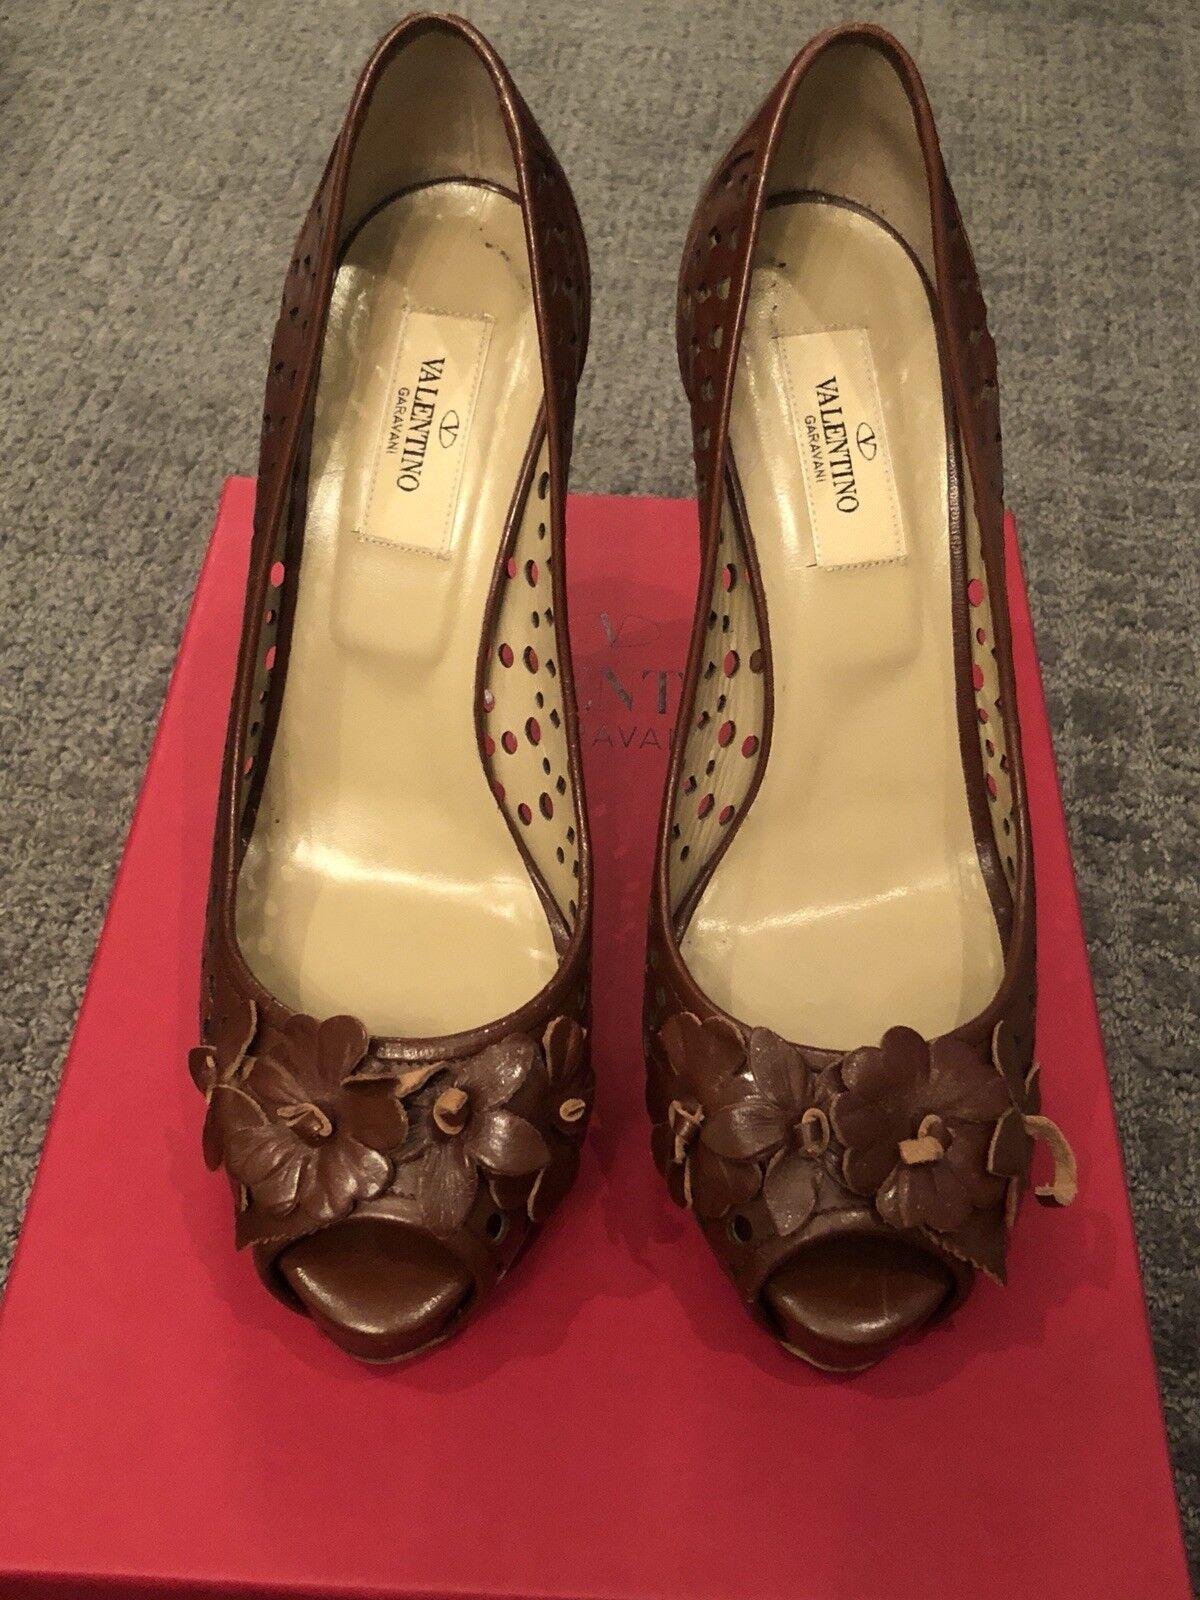 Valentino Garavani marron Perforated Leather Open Toe High Heels Taille 38